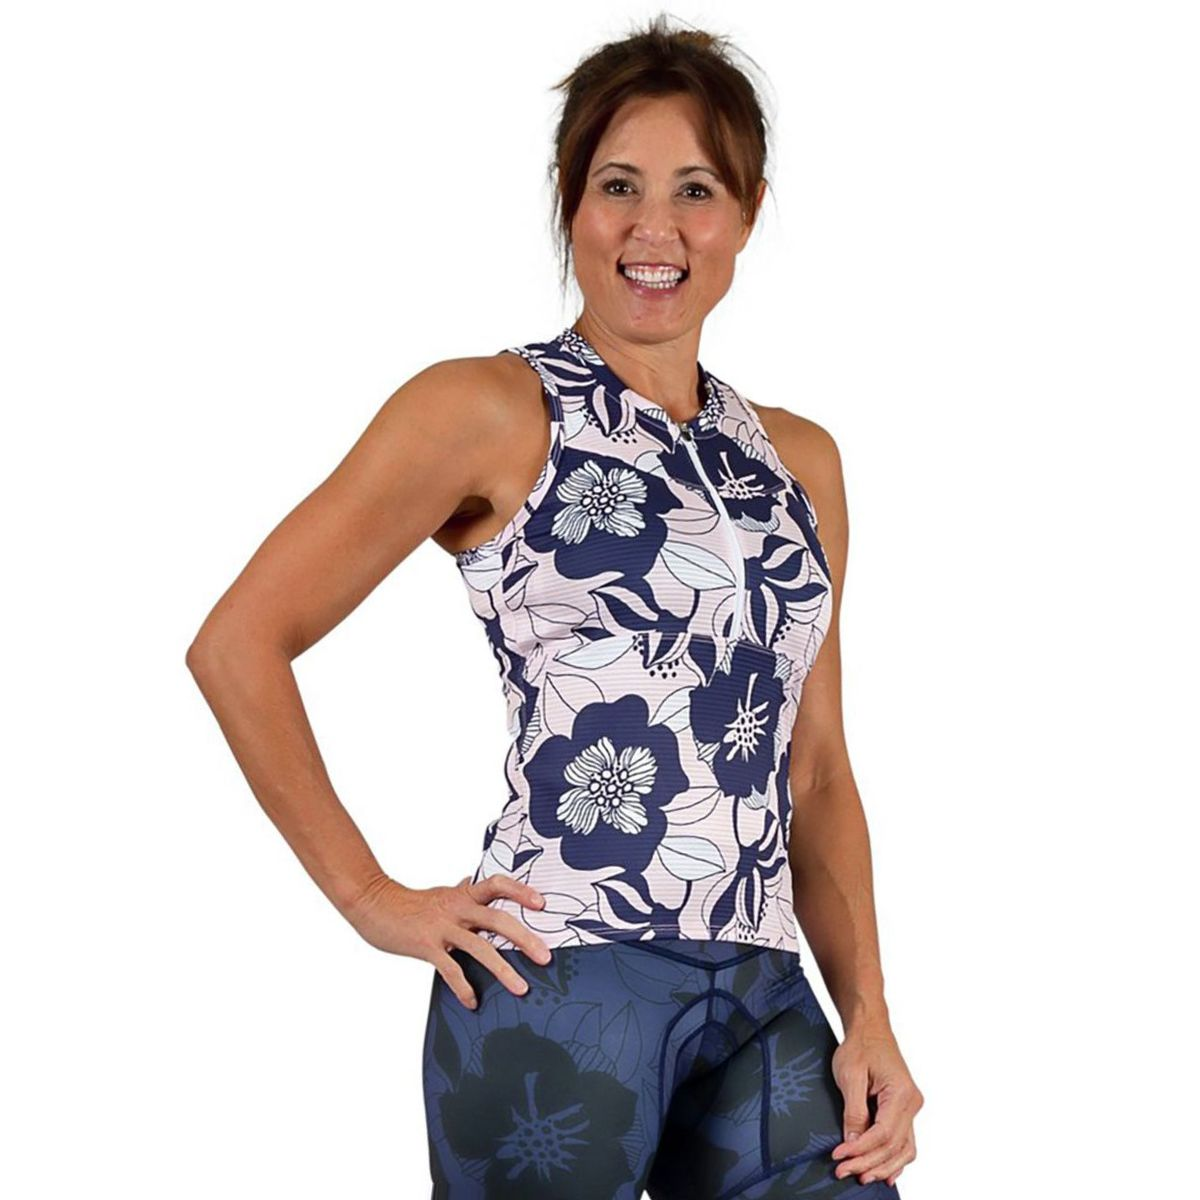 SheBeest Bronzebella Sleeveless Jersey - Women's